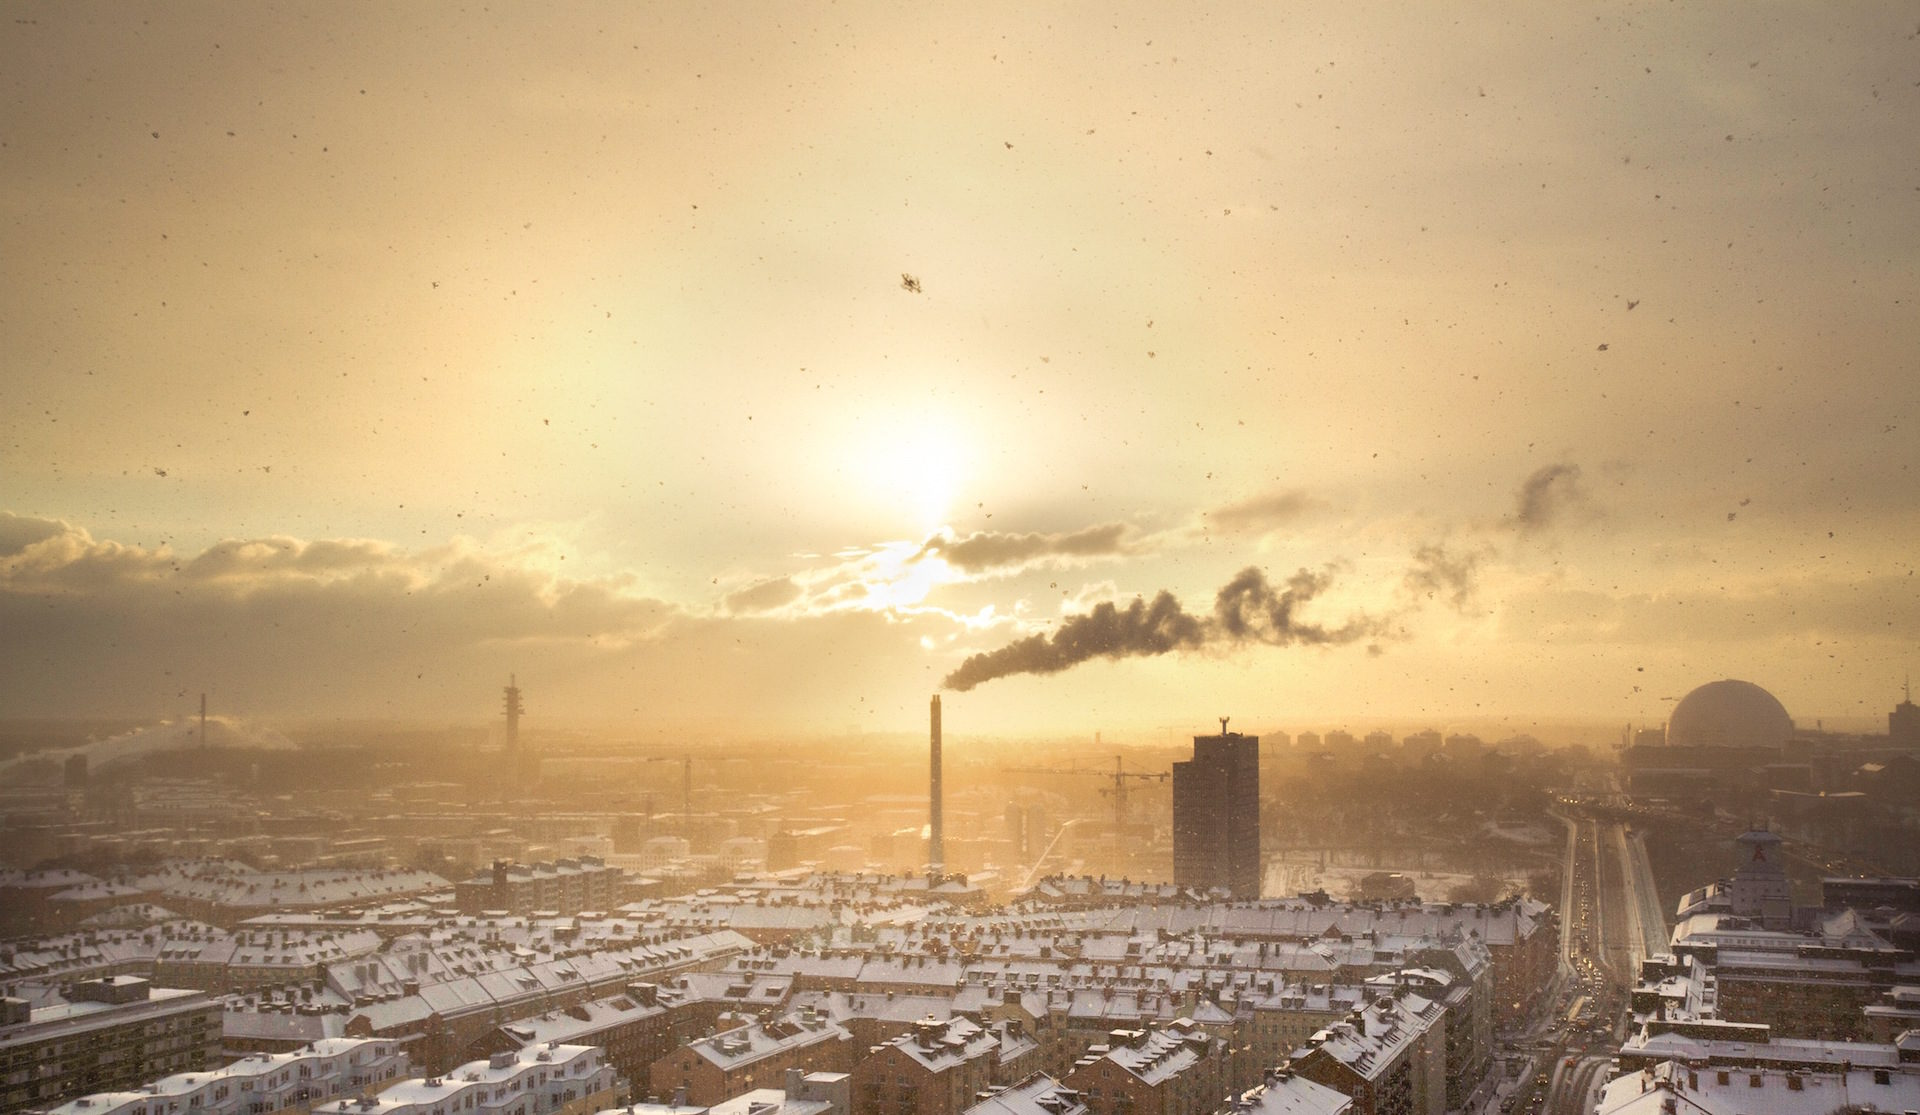 fumo, nuvole, polución, inquinamento, polvere - Sfondi HD - Professor-falken.com